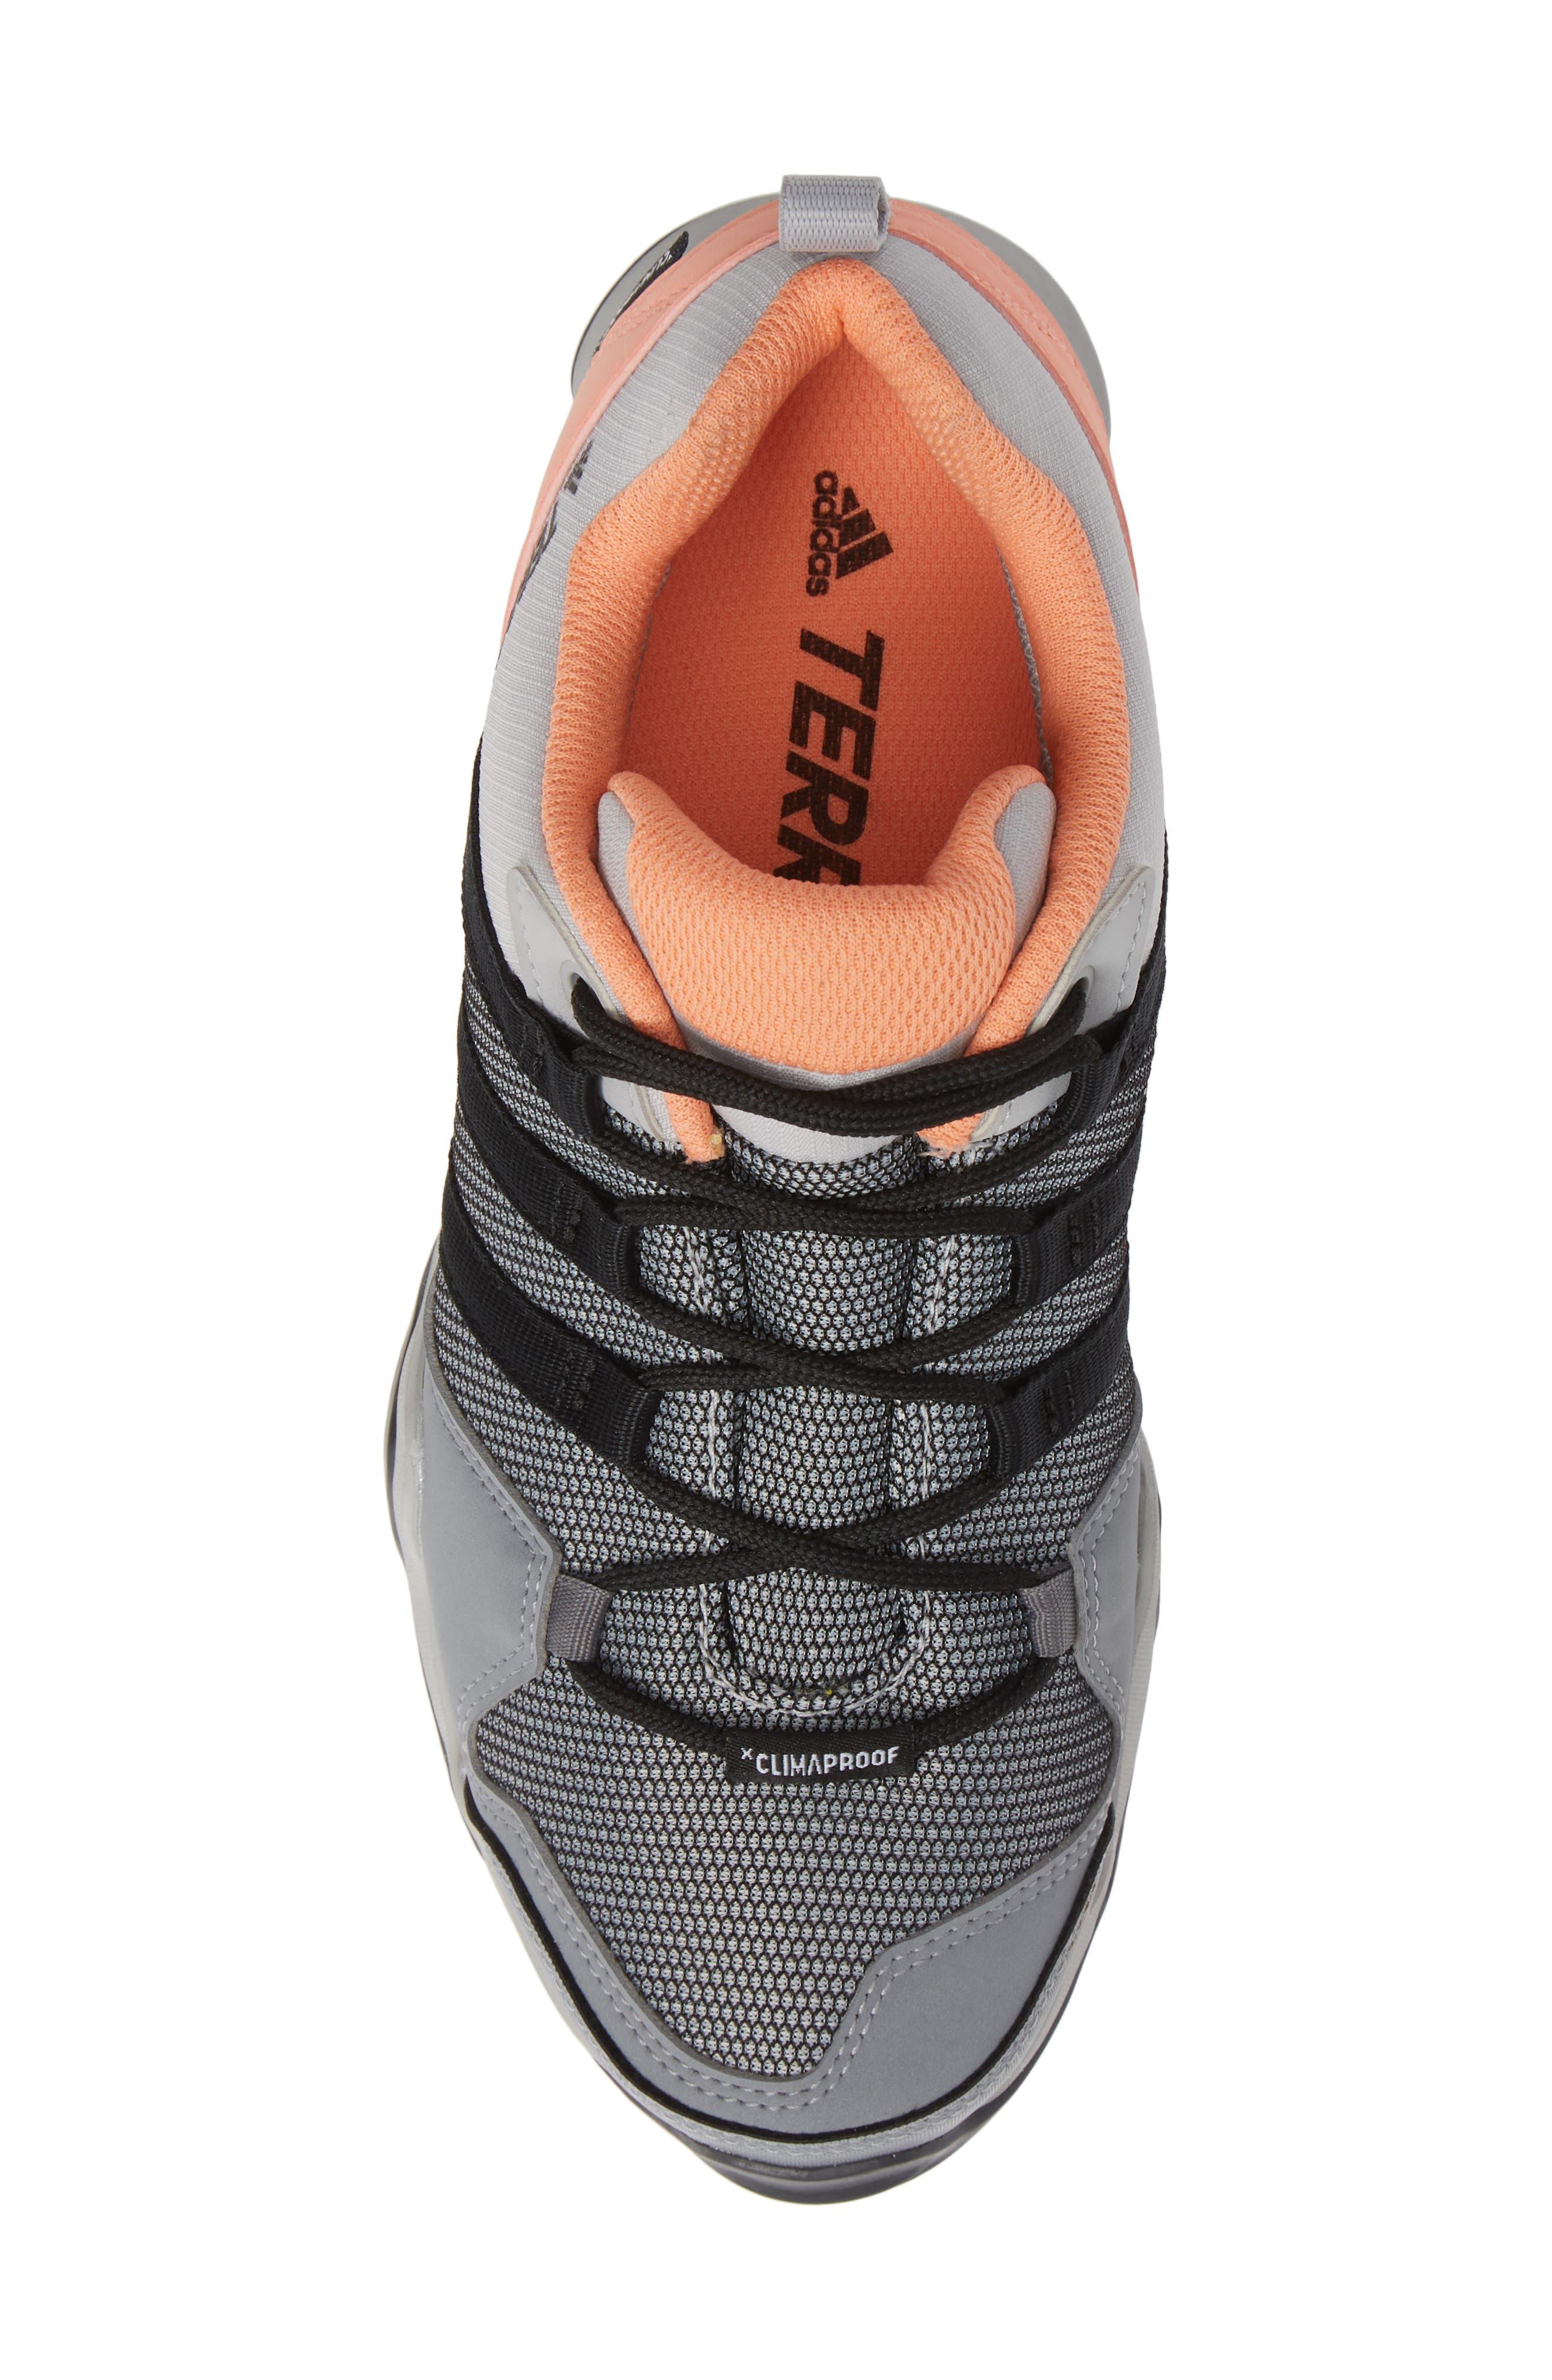 Terrex AX2 CLIMAPROOF<sup>®</sup> Hiking Shoe,                             Alternate thumbnail 5, color,                             GREY/ BLACK/ CHALK CORAL